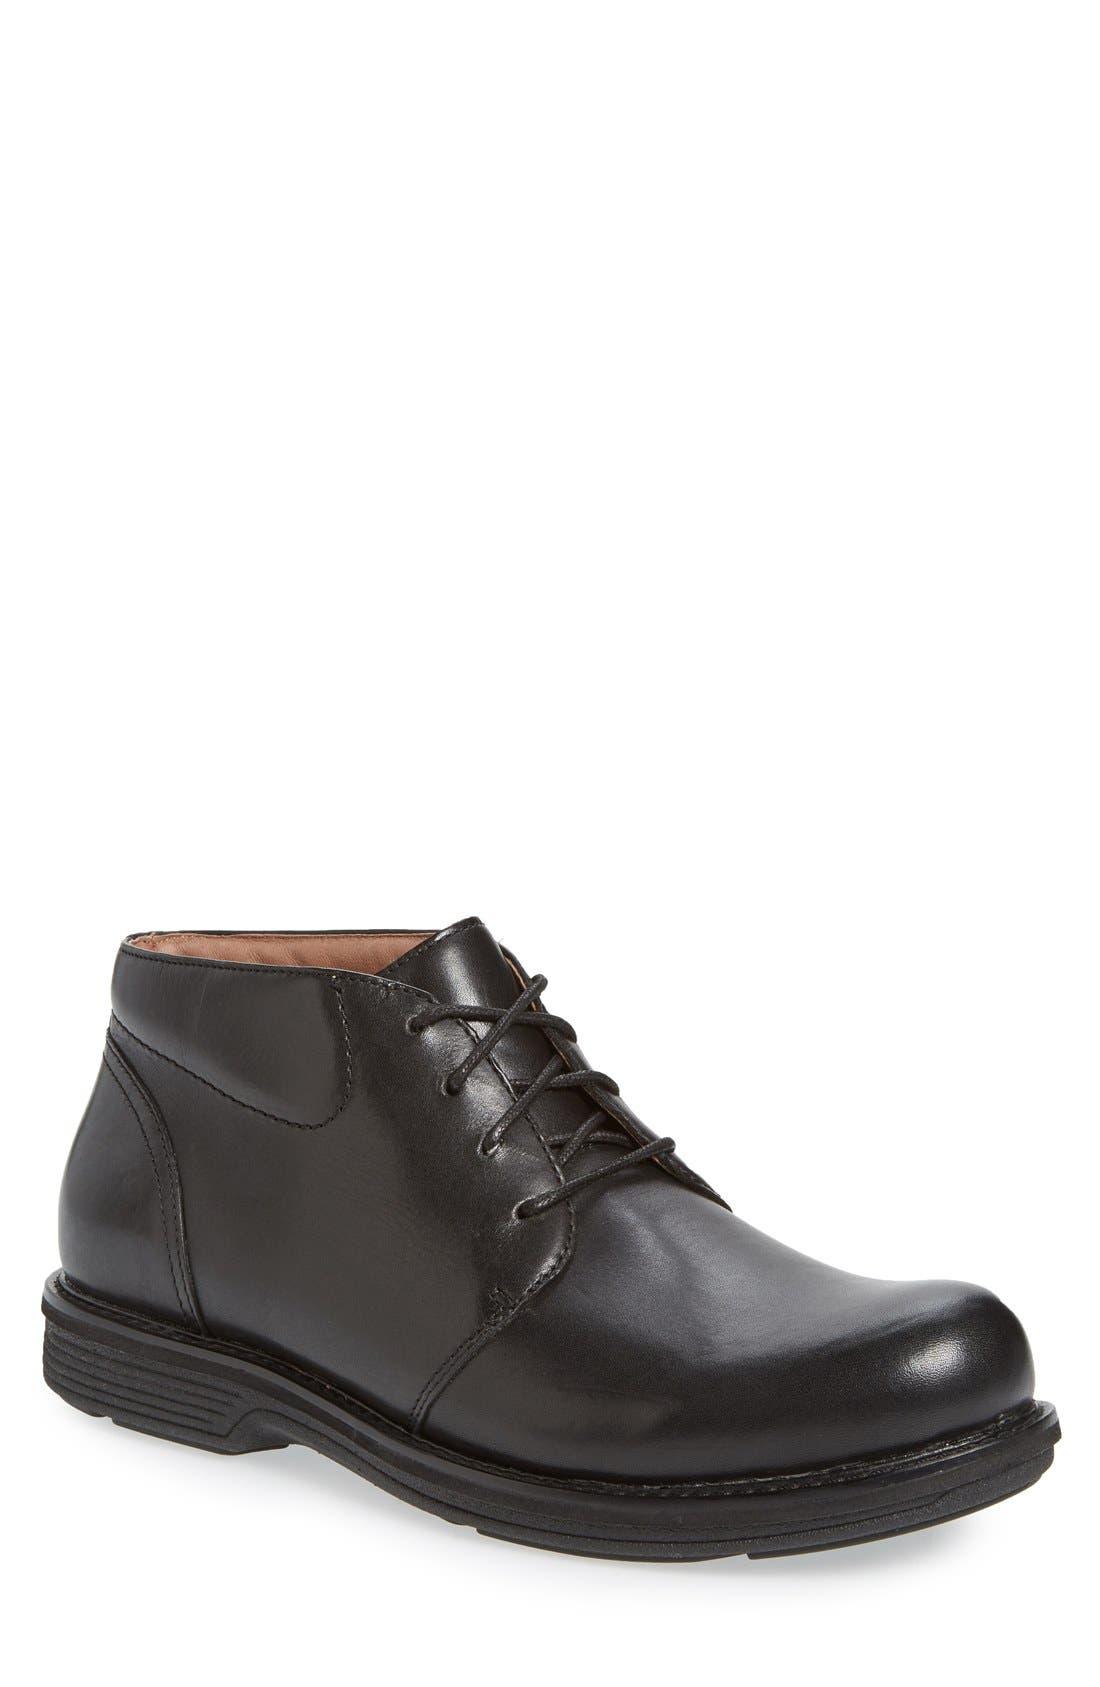 Main Image - Dansko 'Jake' Chukka Boot (Men)